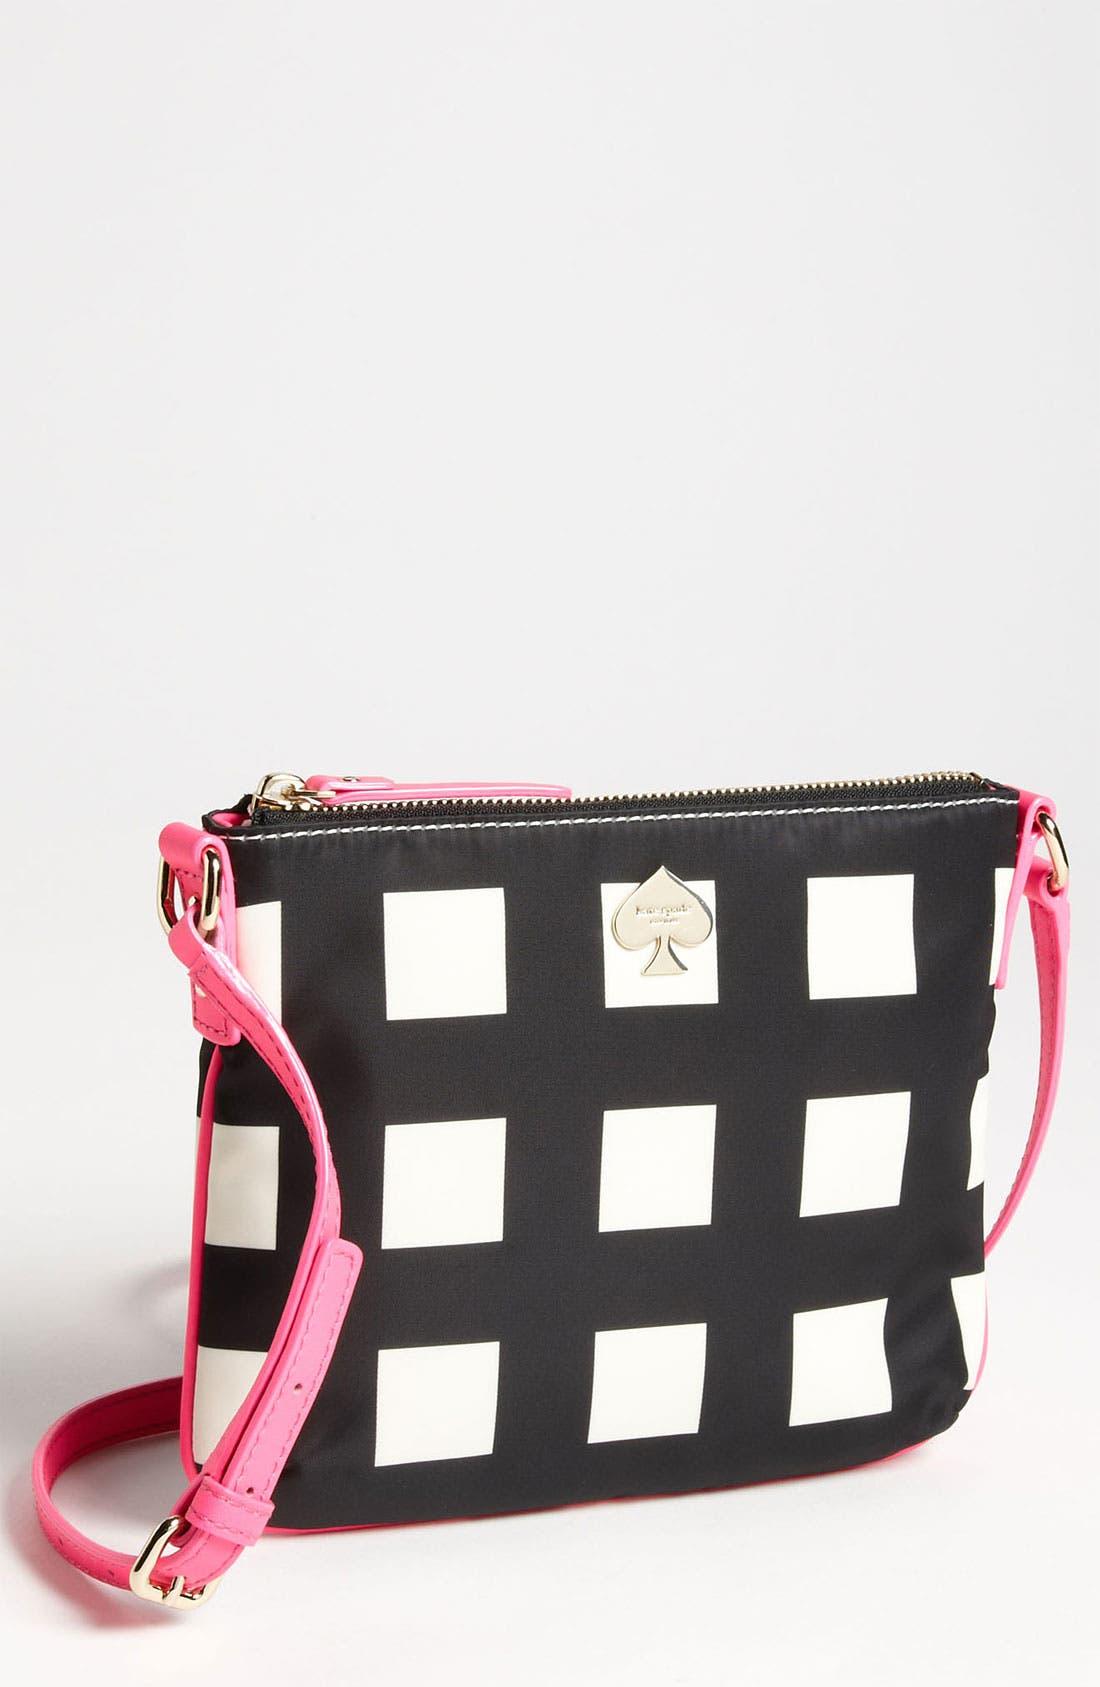 Main Image - kate spade new york 'berry street - tenley' crossbody bag